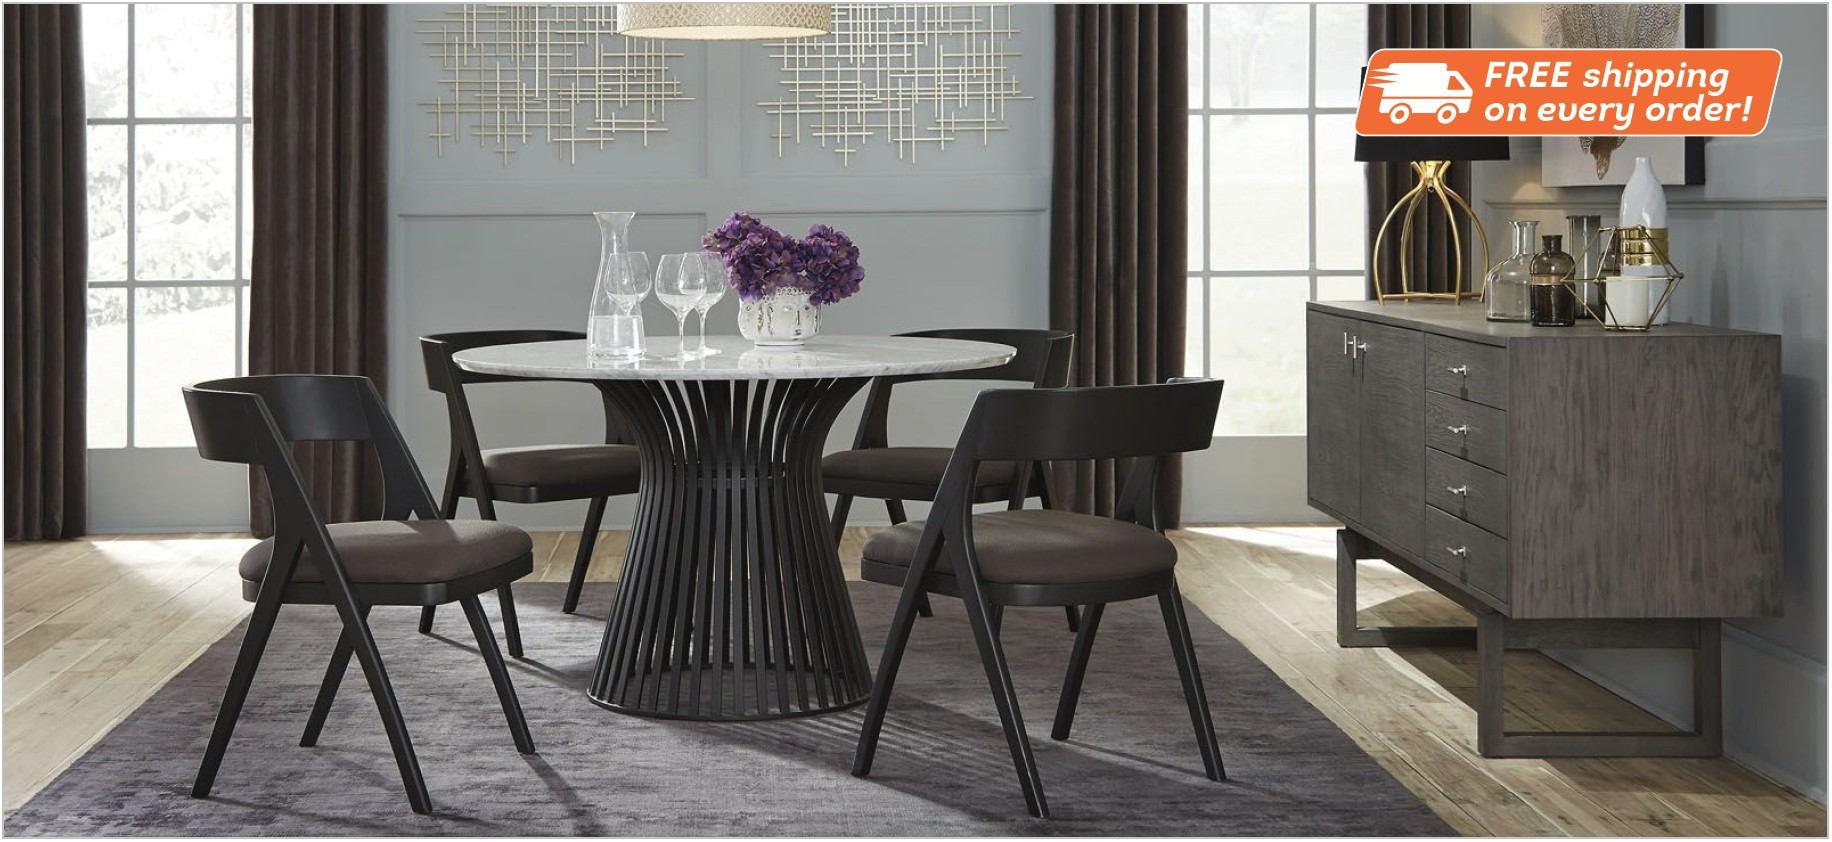 Coleman Dining Room Furniture